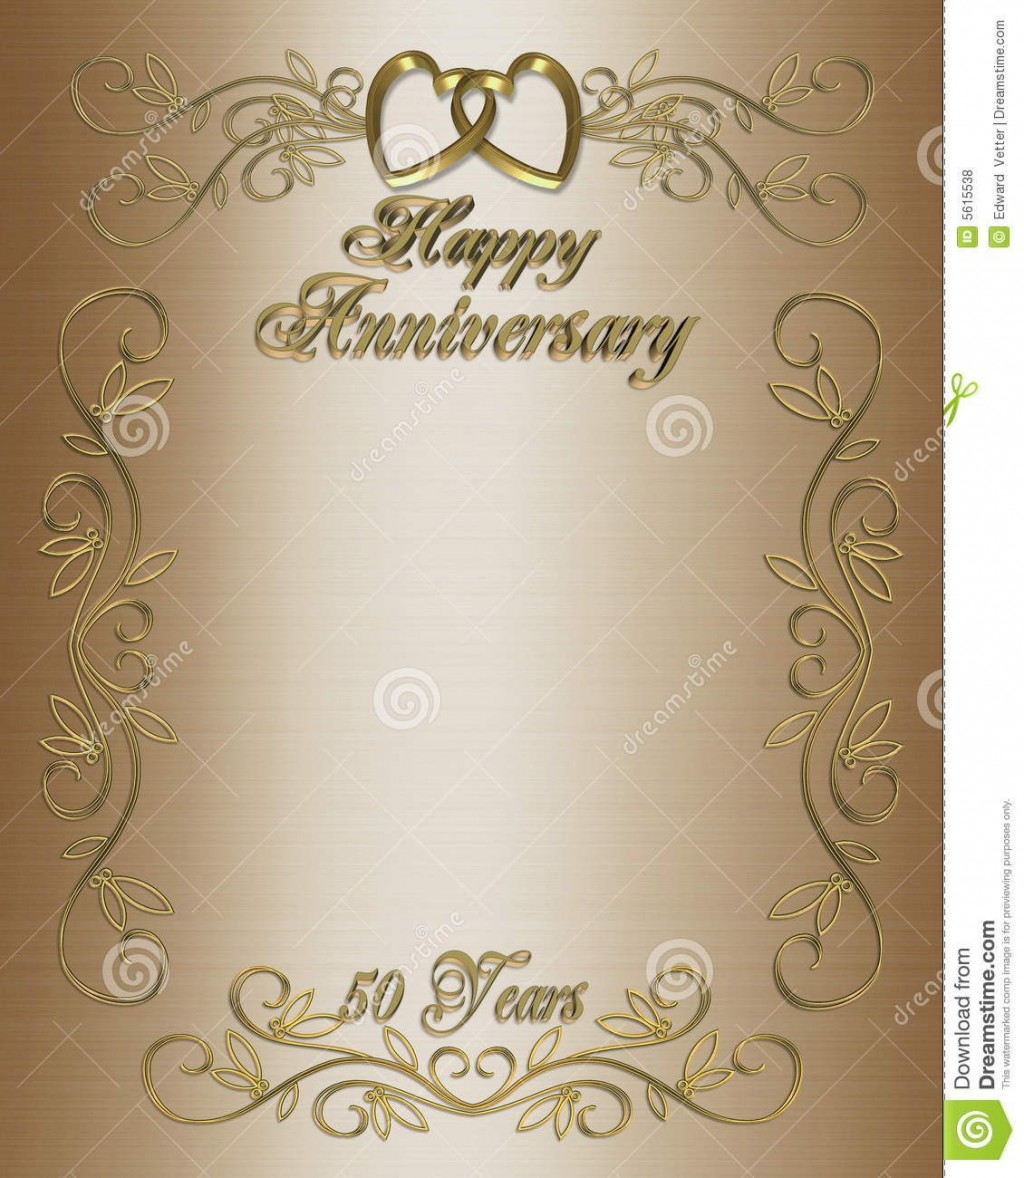 005 Dreaded 50th Wedding Anniversary Invitation Template Free High Def  Download Golden Microsoft WordLarge